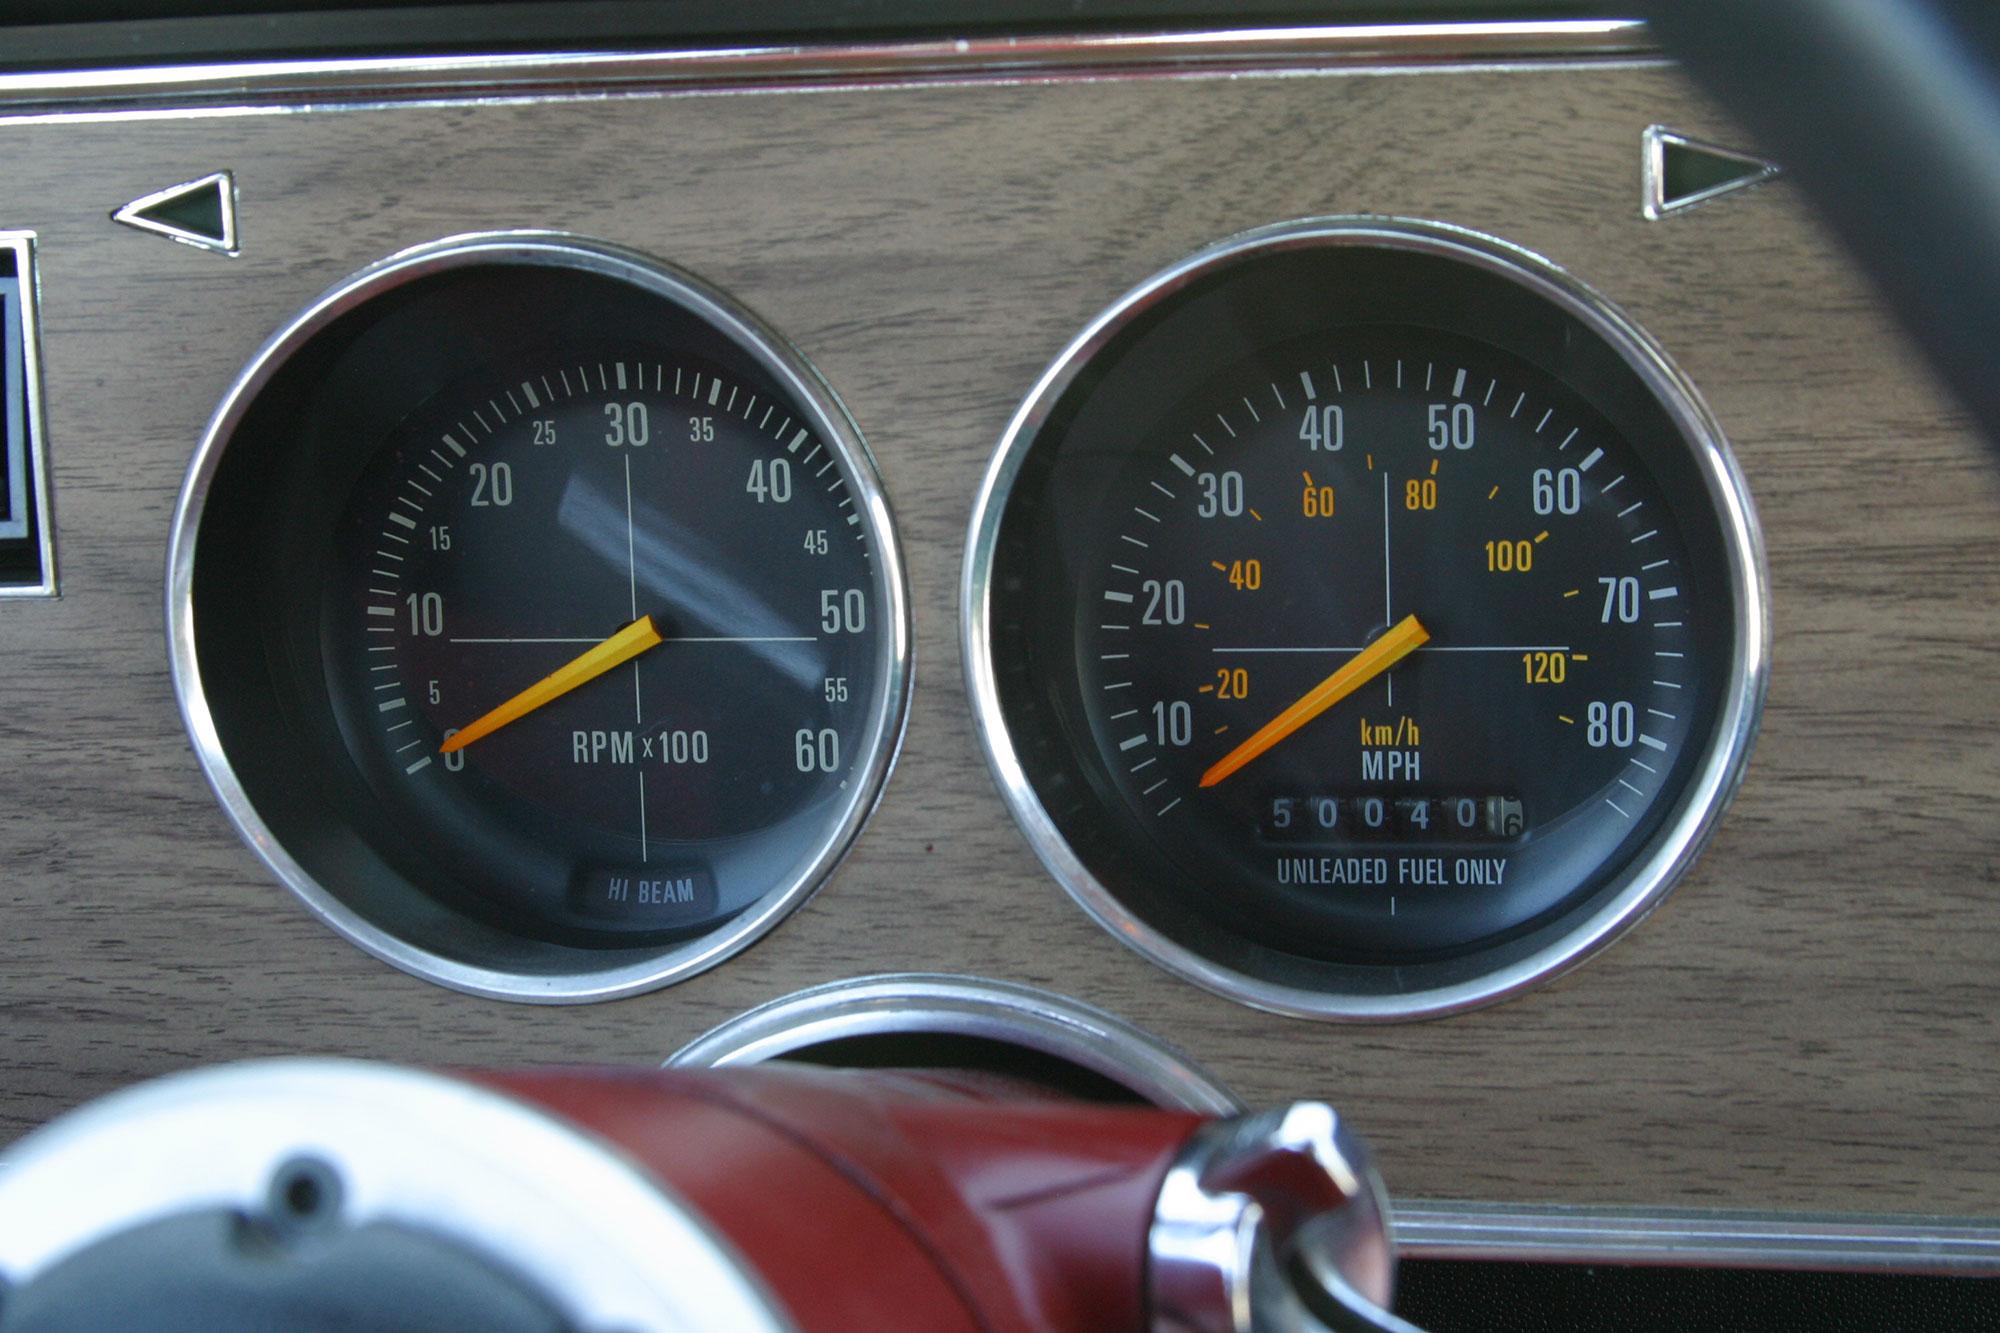 Mustang II dash